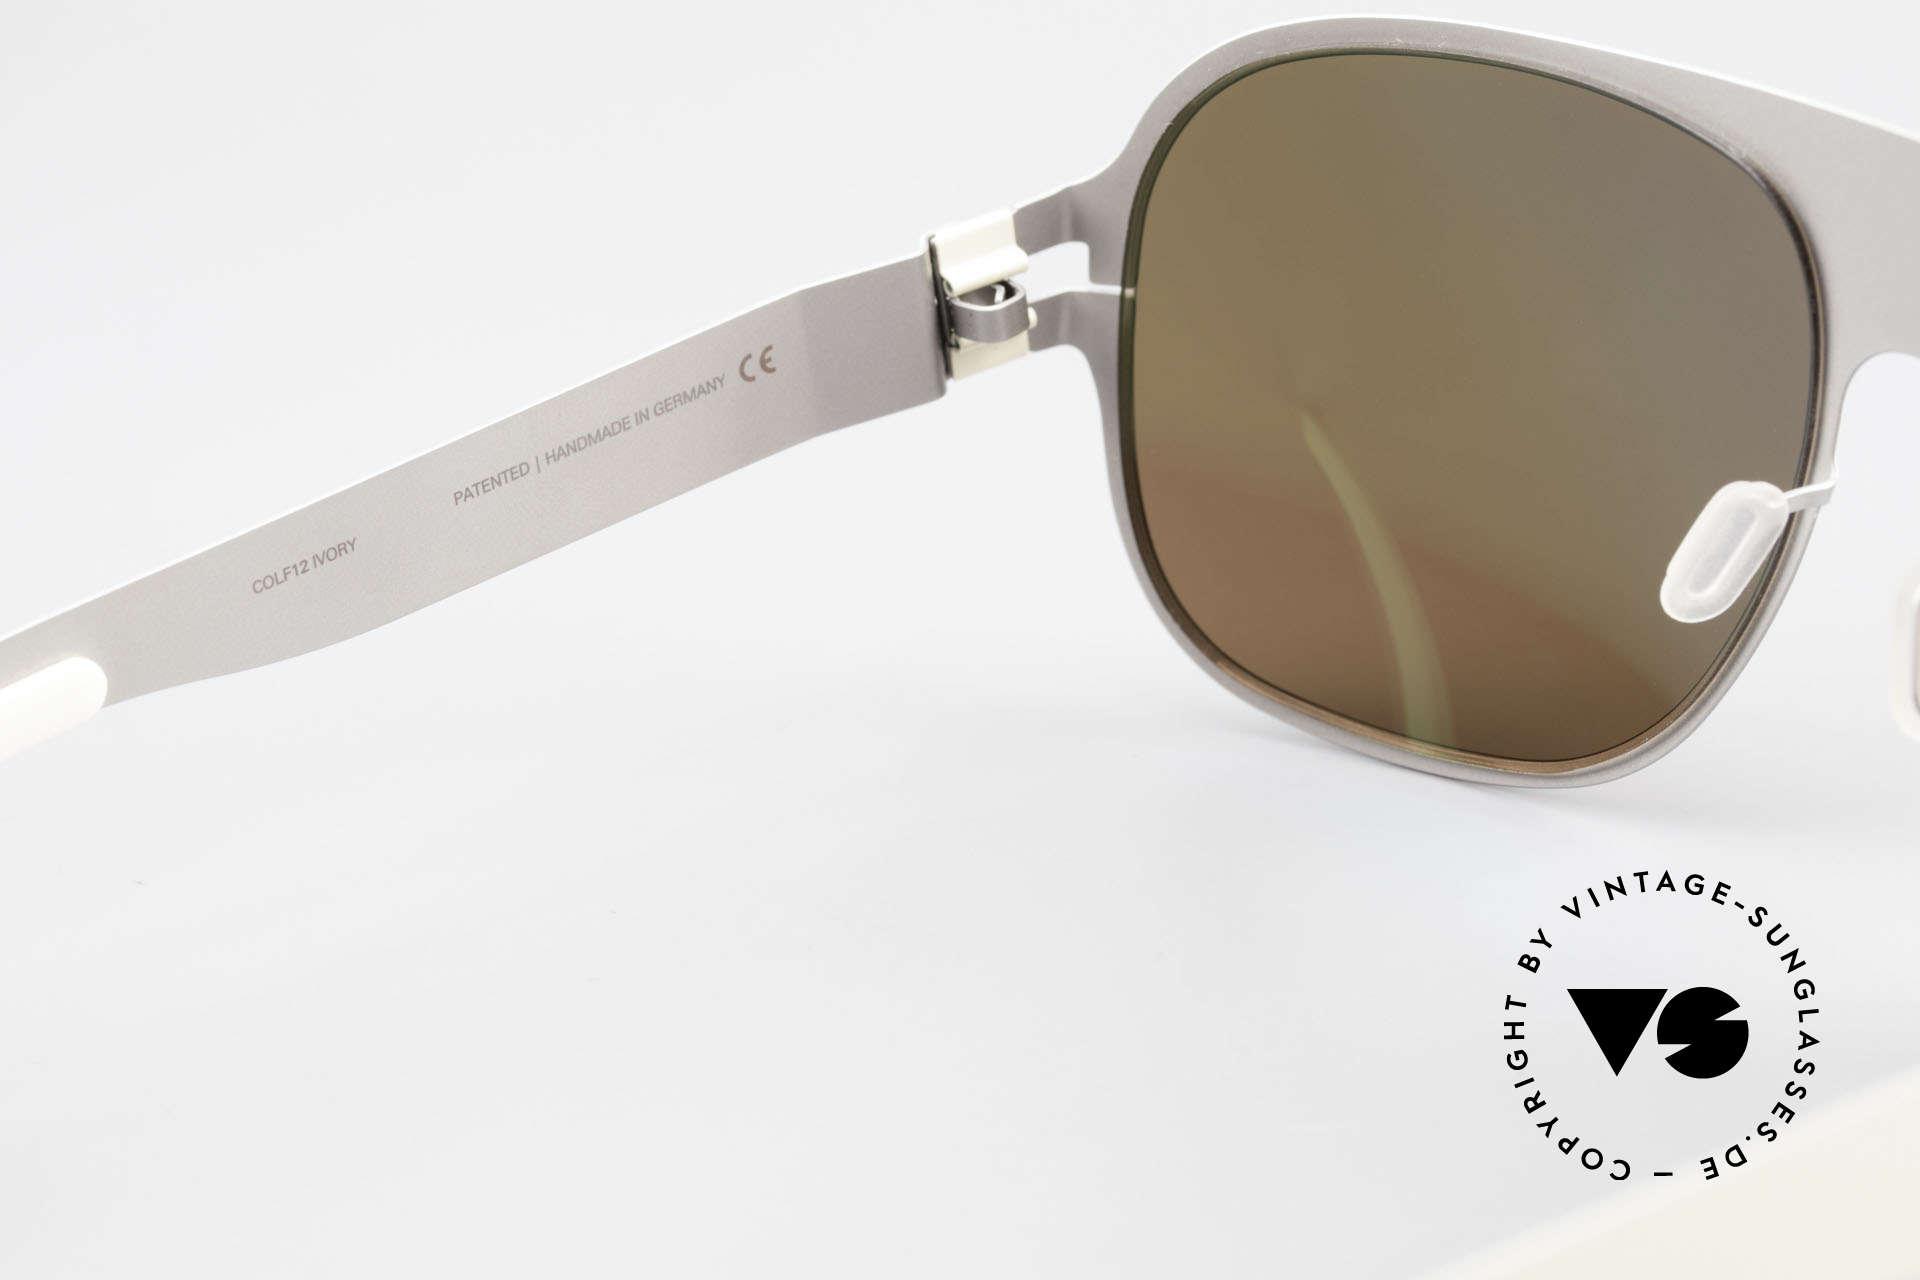 Mykita Rodney Limited Designer Sunglasses, Size: medium, Made for Men